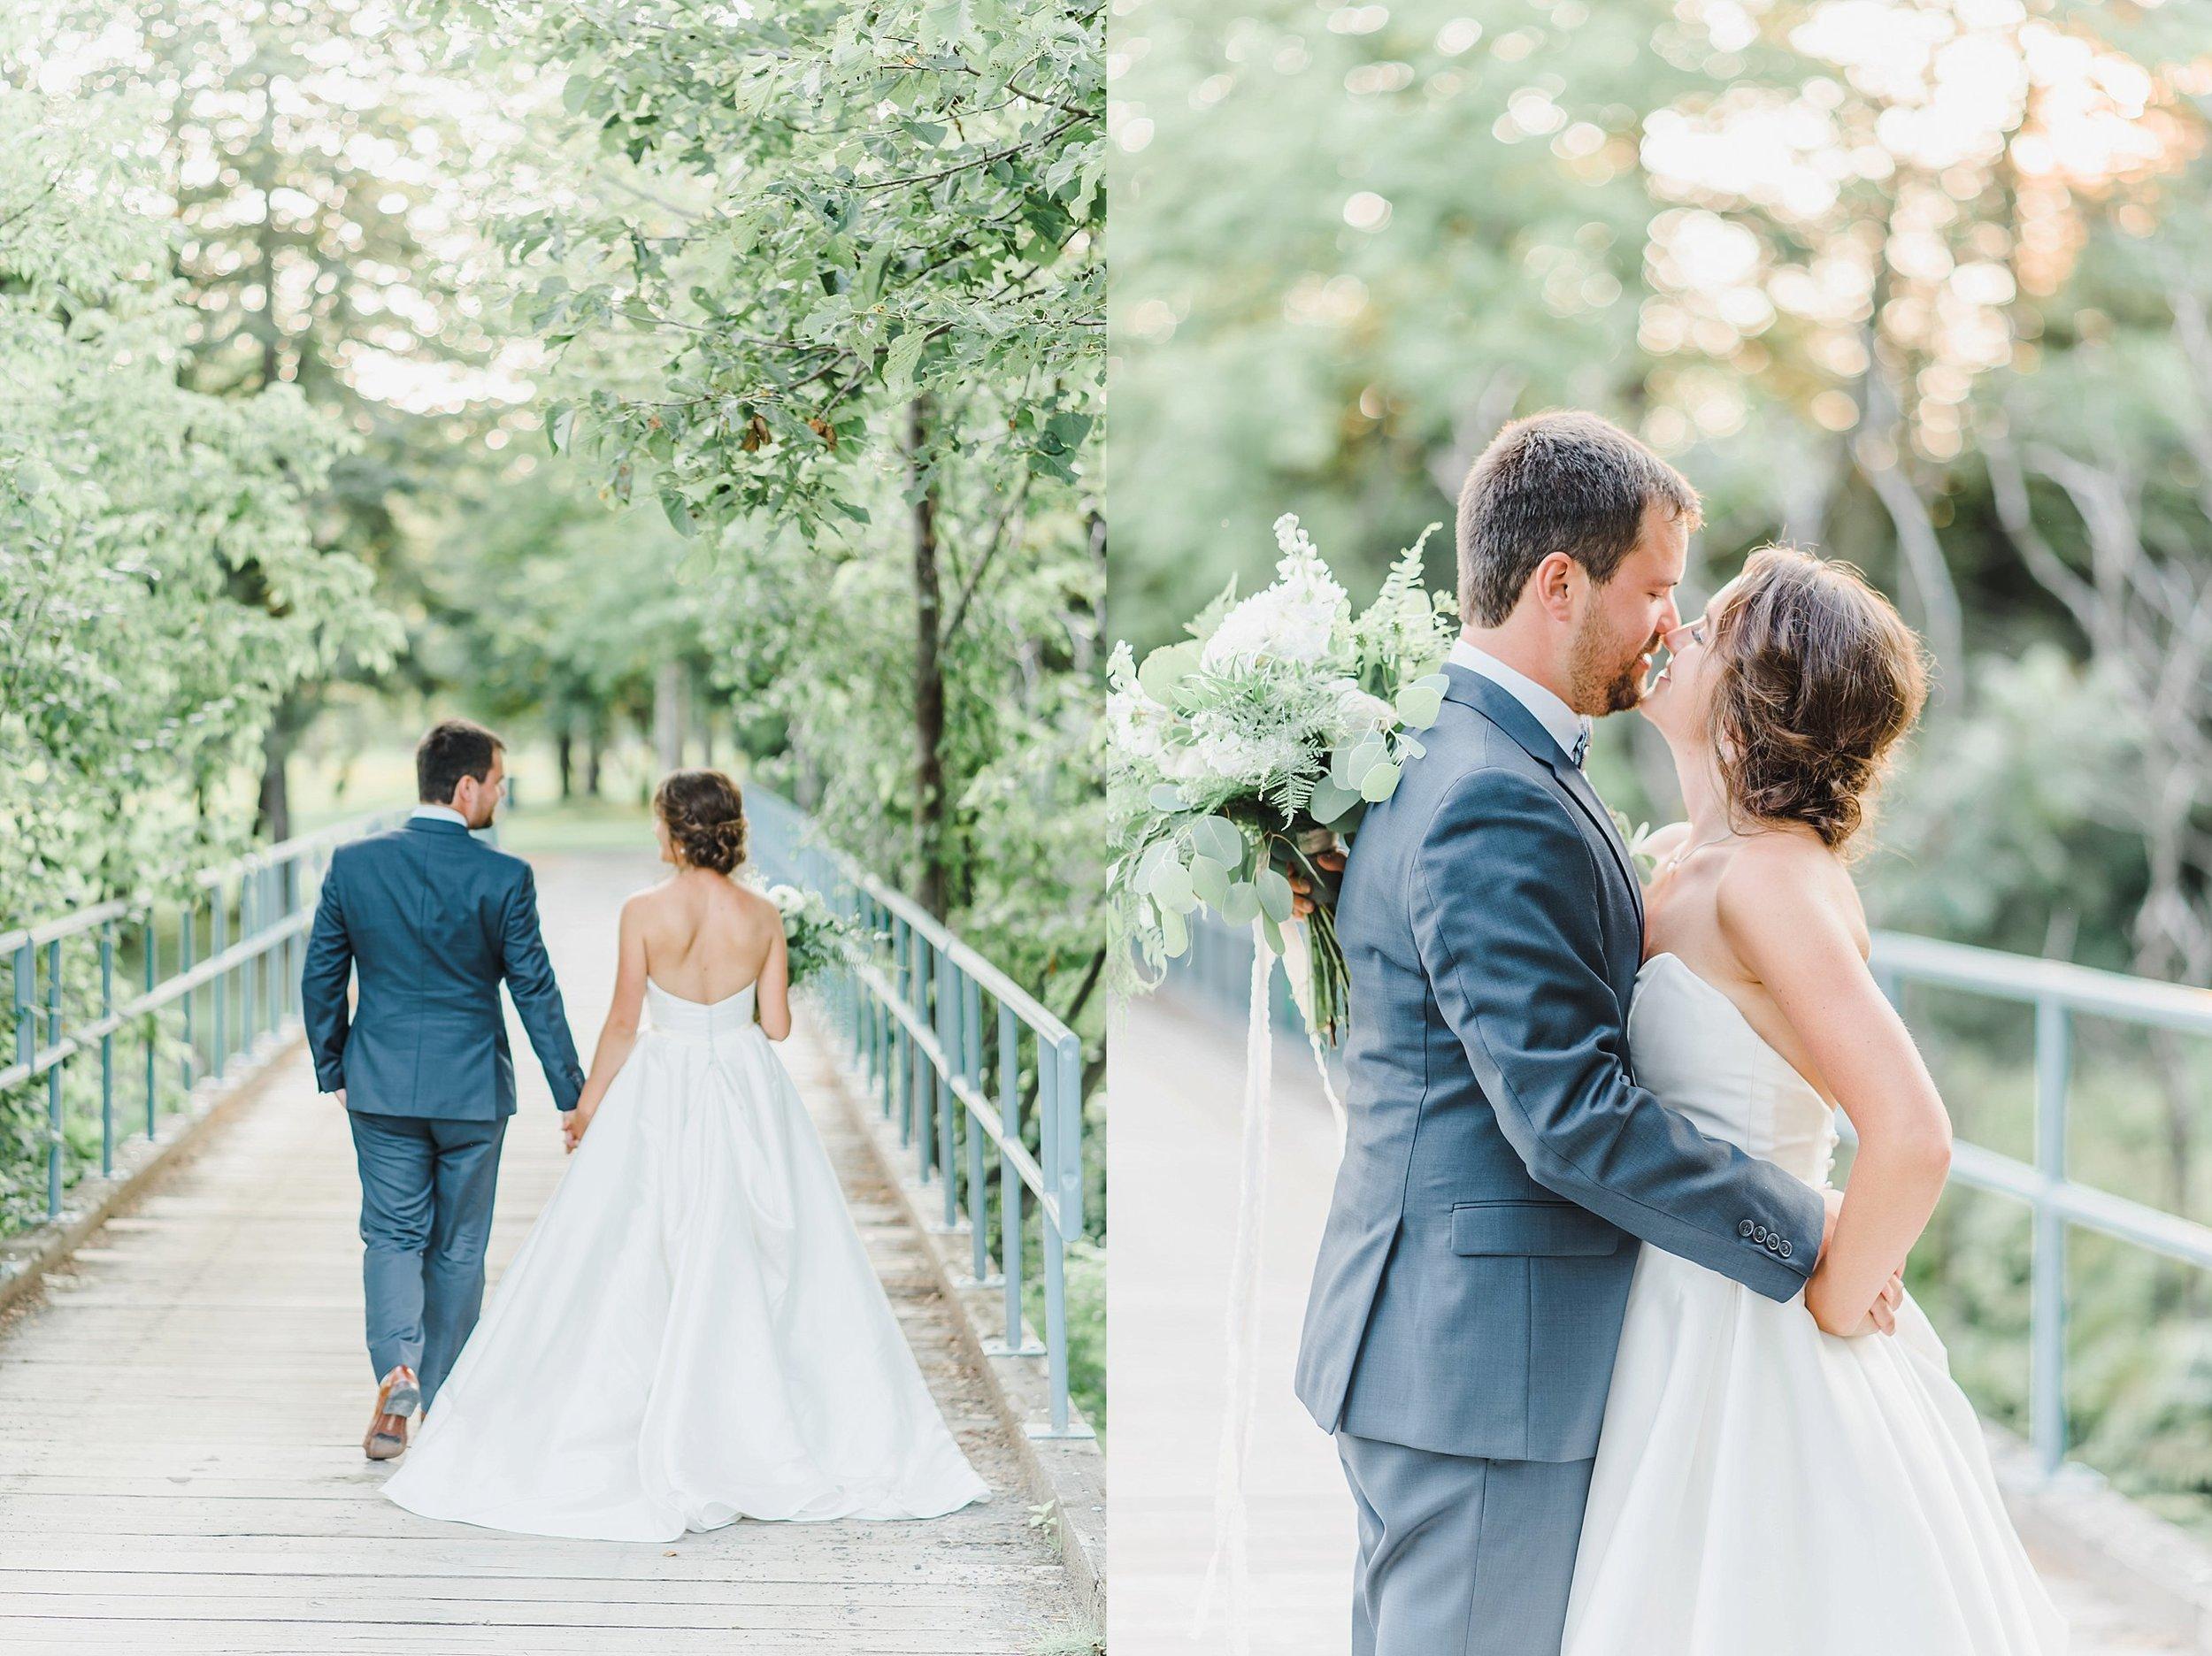 light airy indie fine art ottawa wedding photographer | Ali and Batoul Photography_0569.jpg